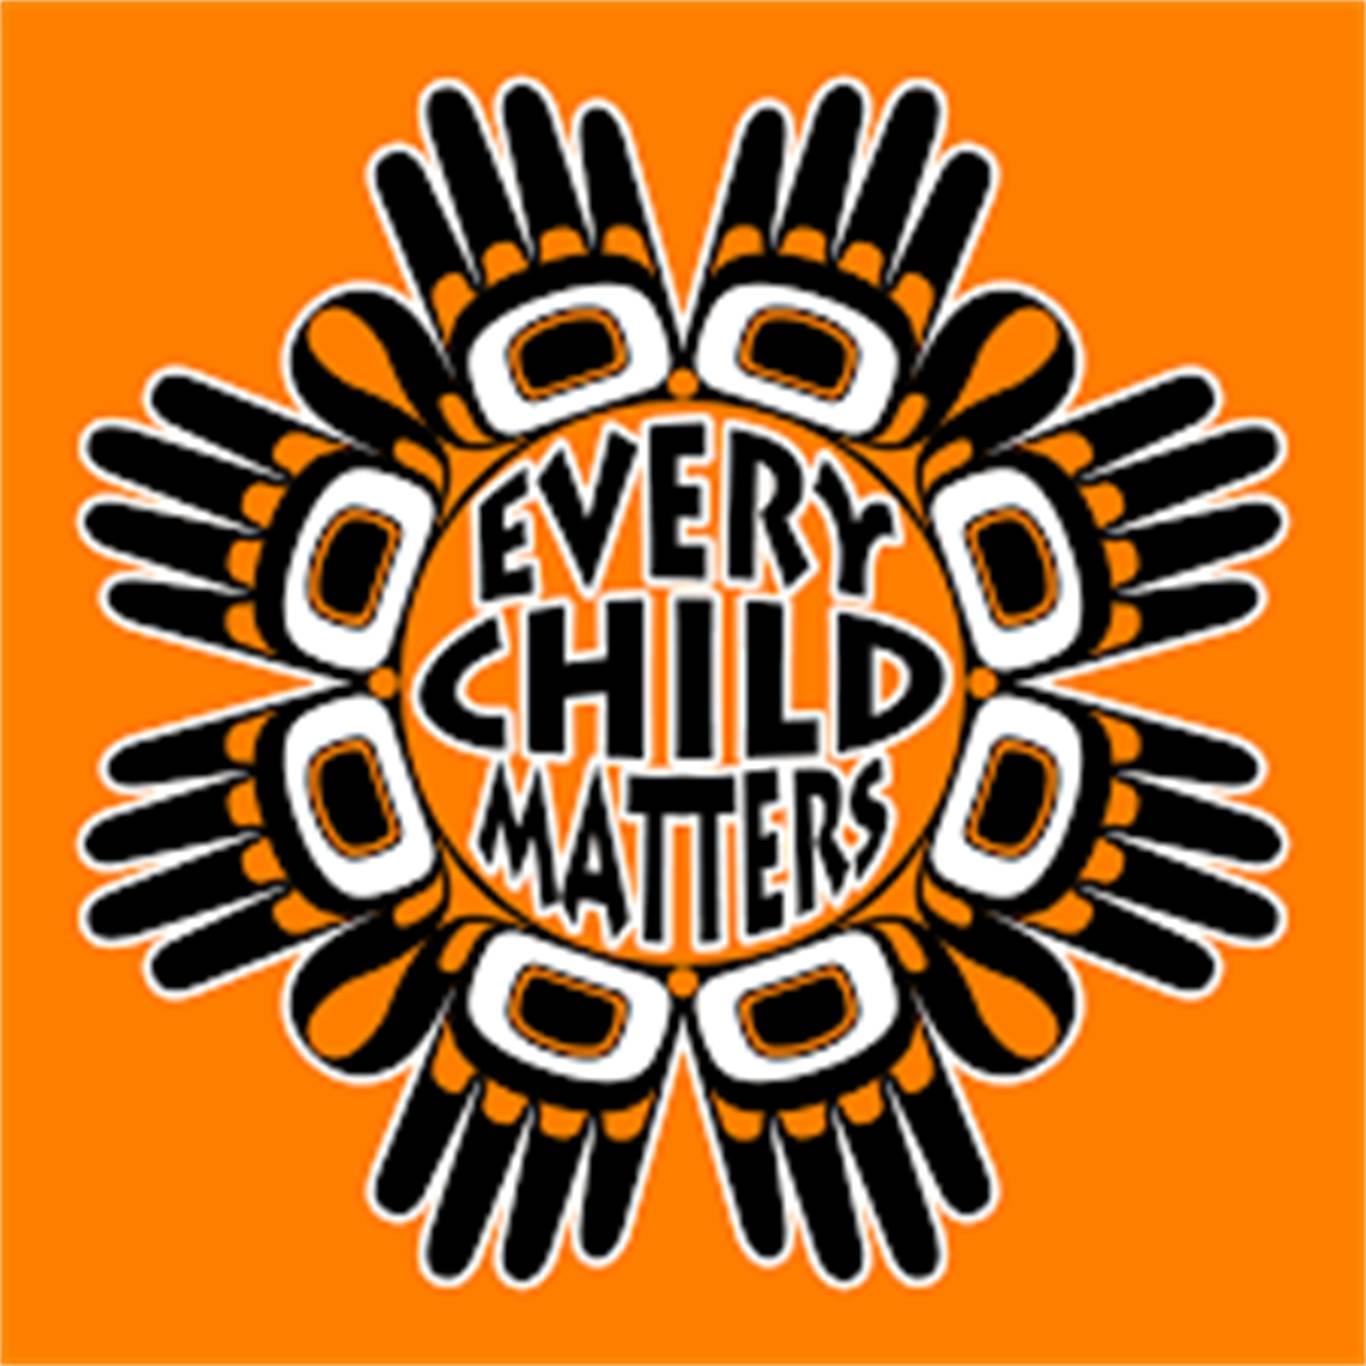 Every_Child_Matters_2_full.jpg